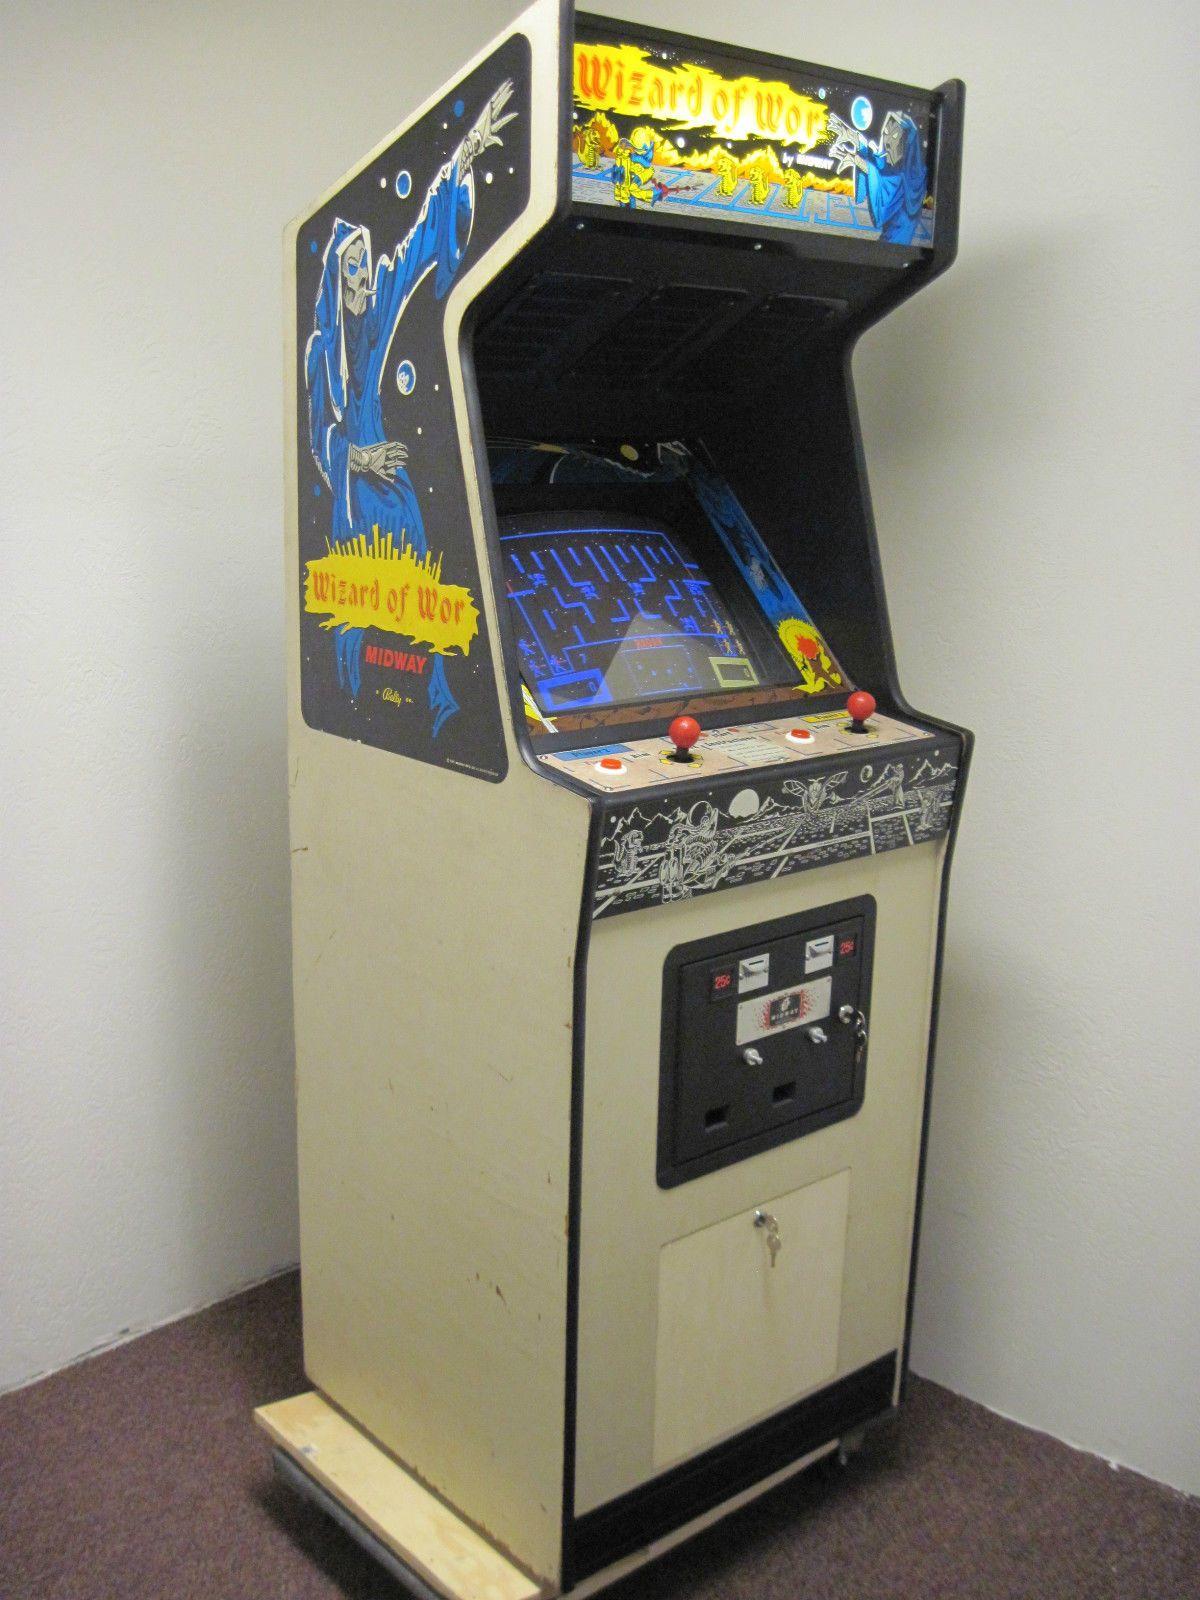 Wizard Of Wor Classic Arcade Game Arcade Games Arcade Vintage Video Games